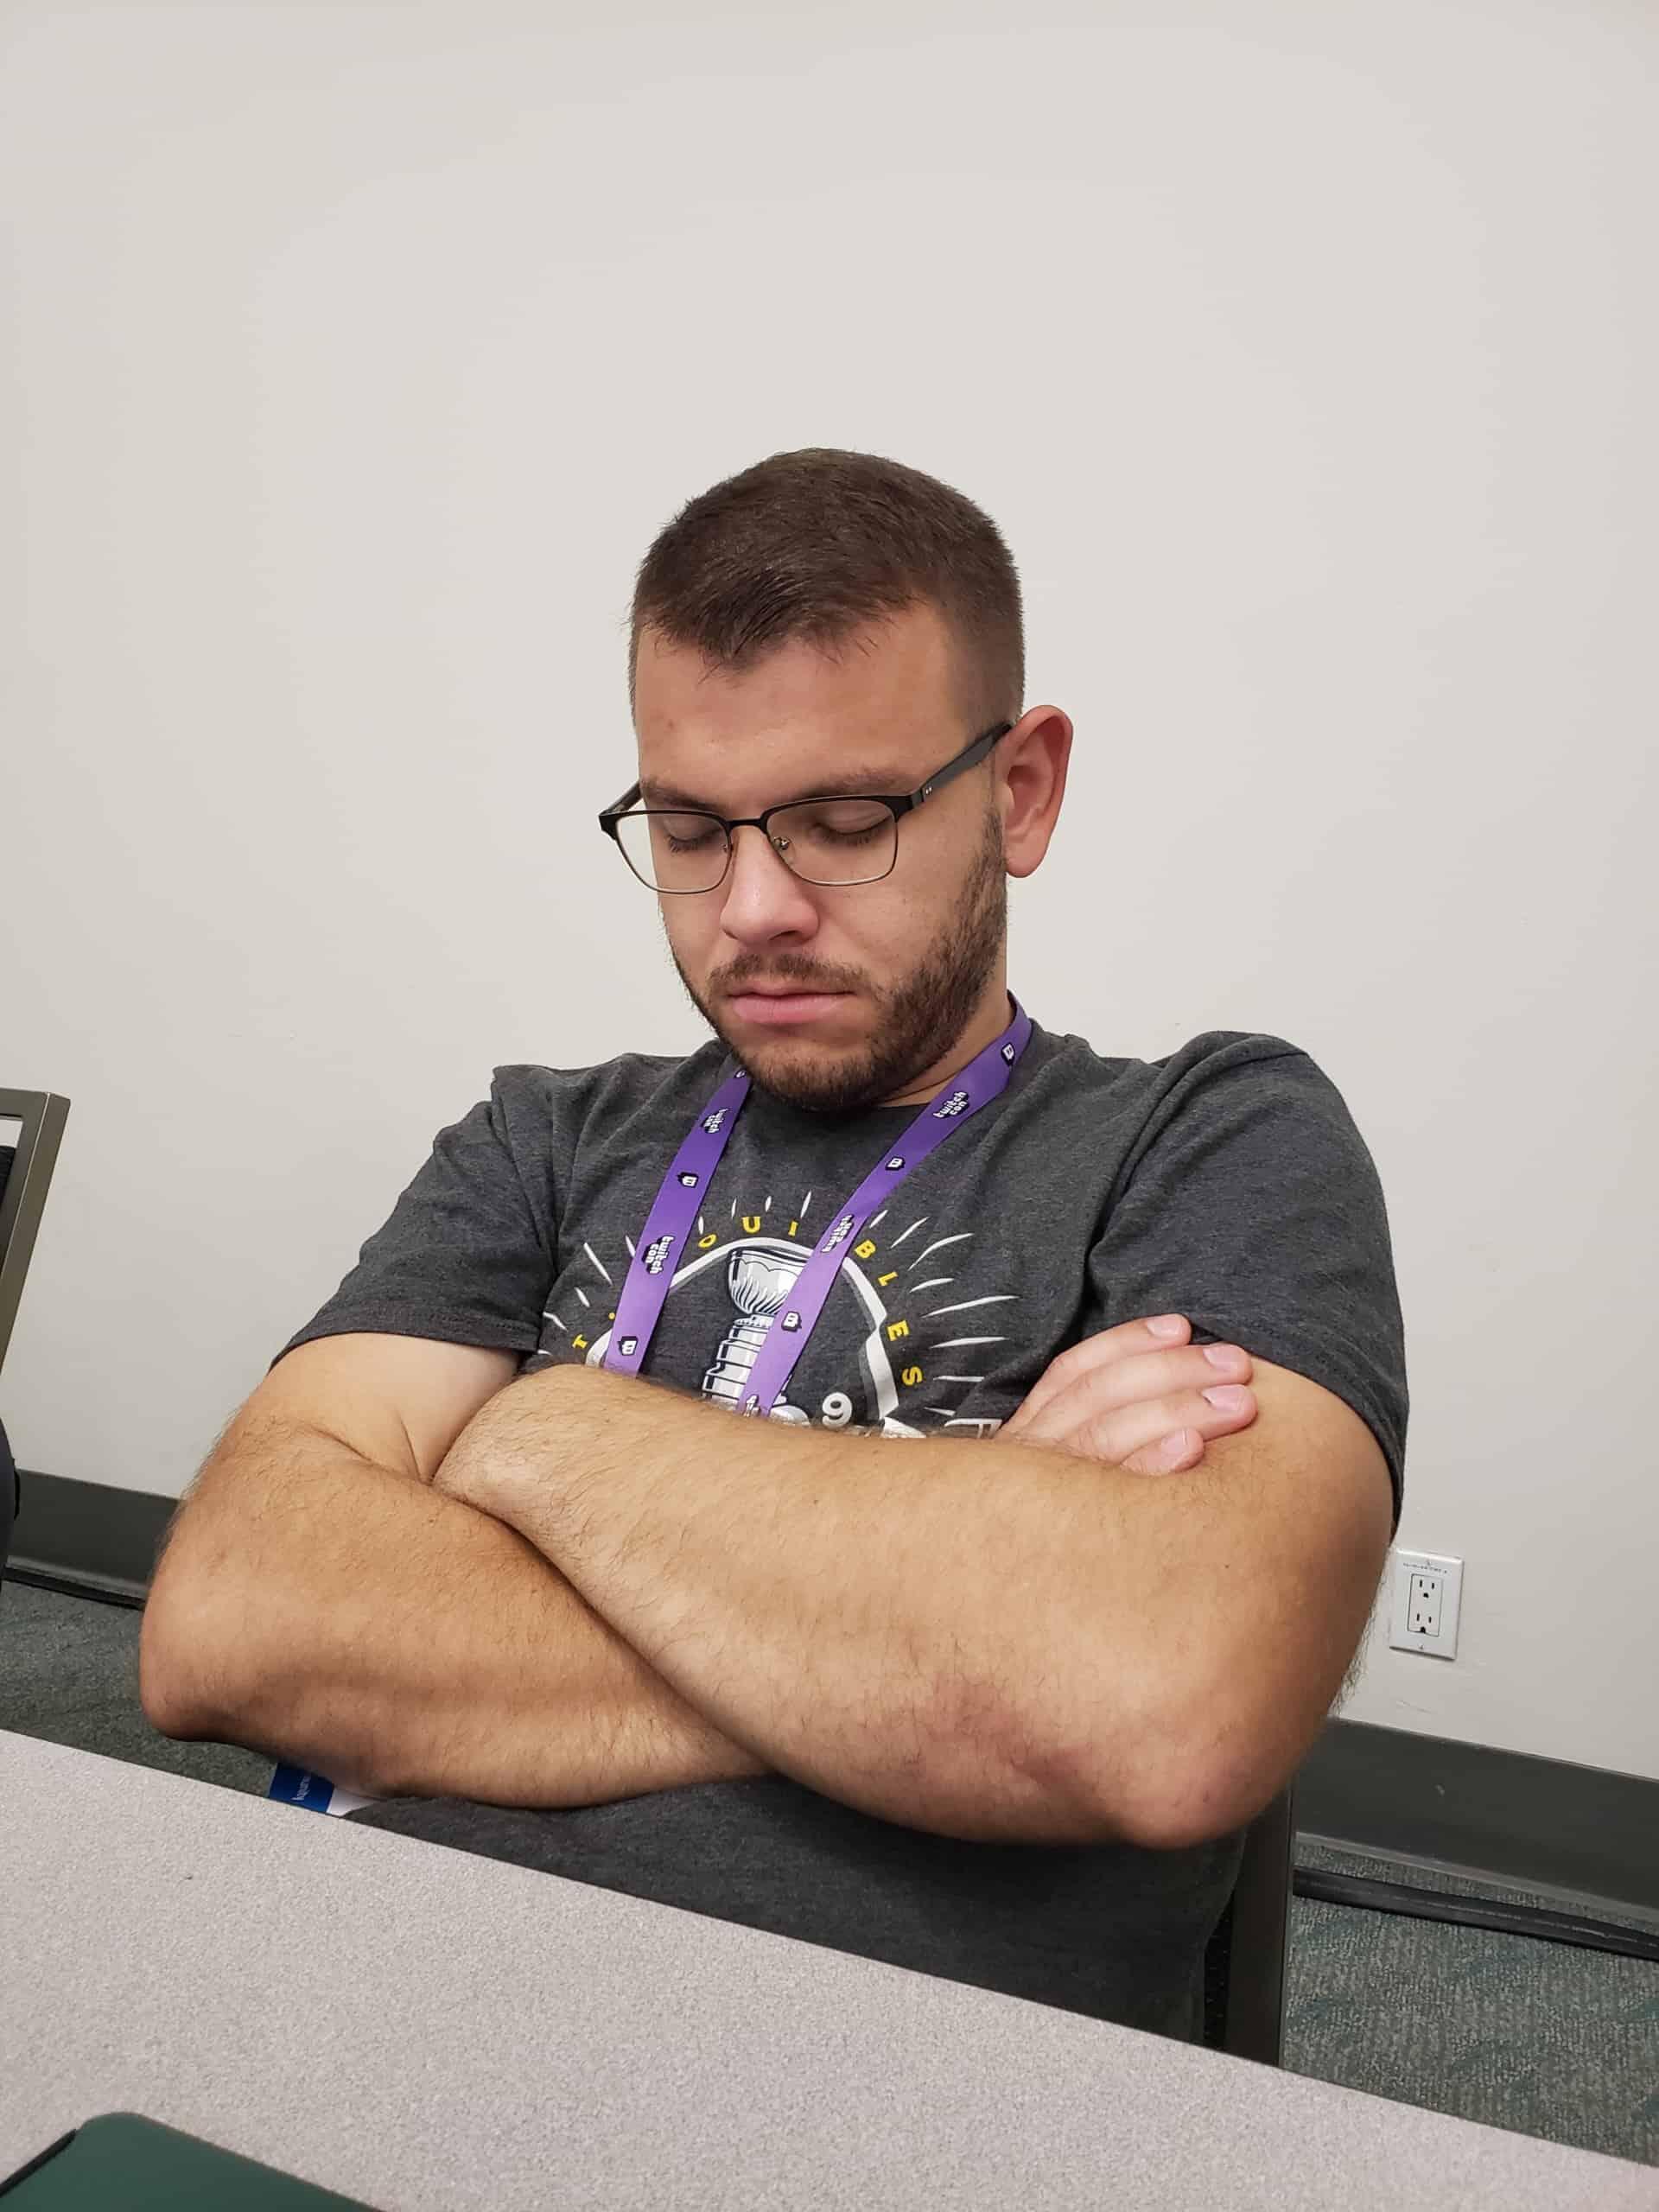 Hank Sleeping at TwitchCon